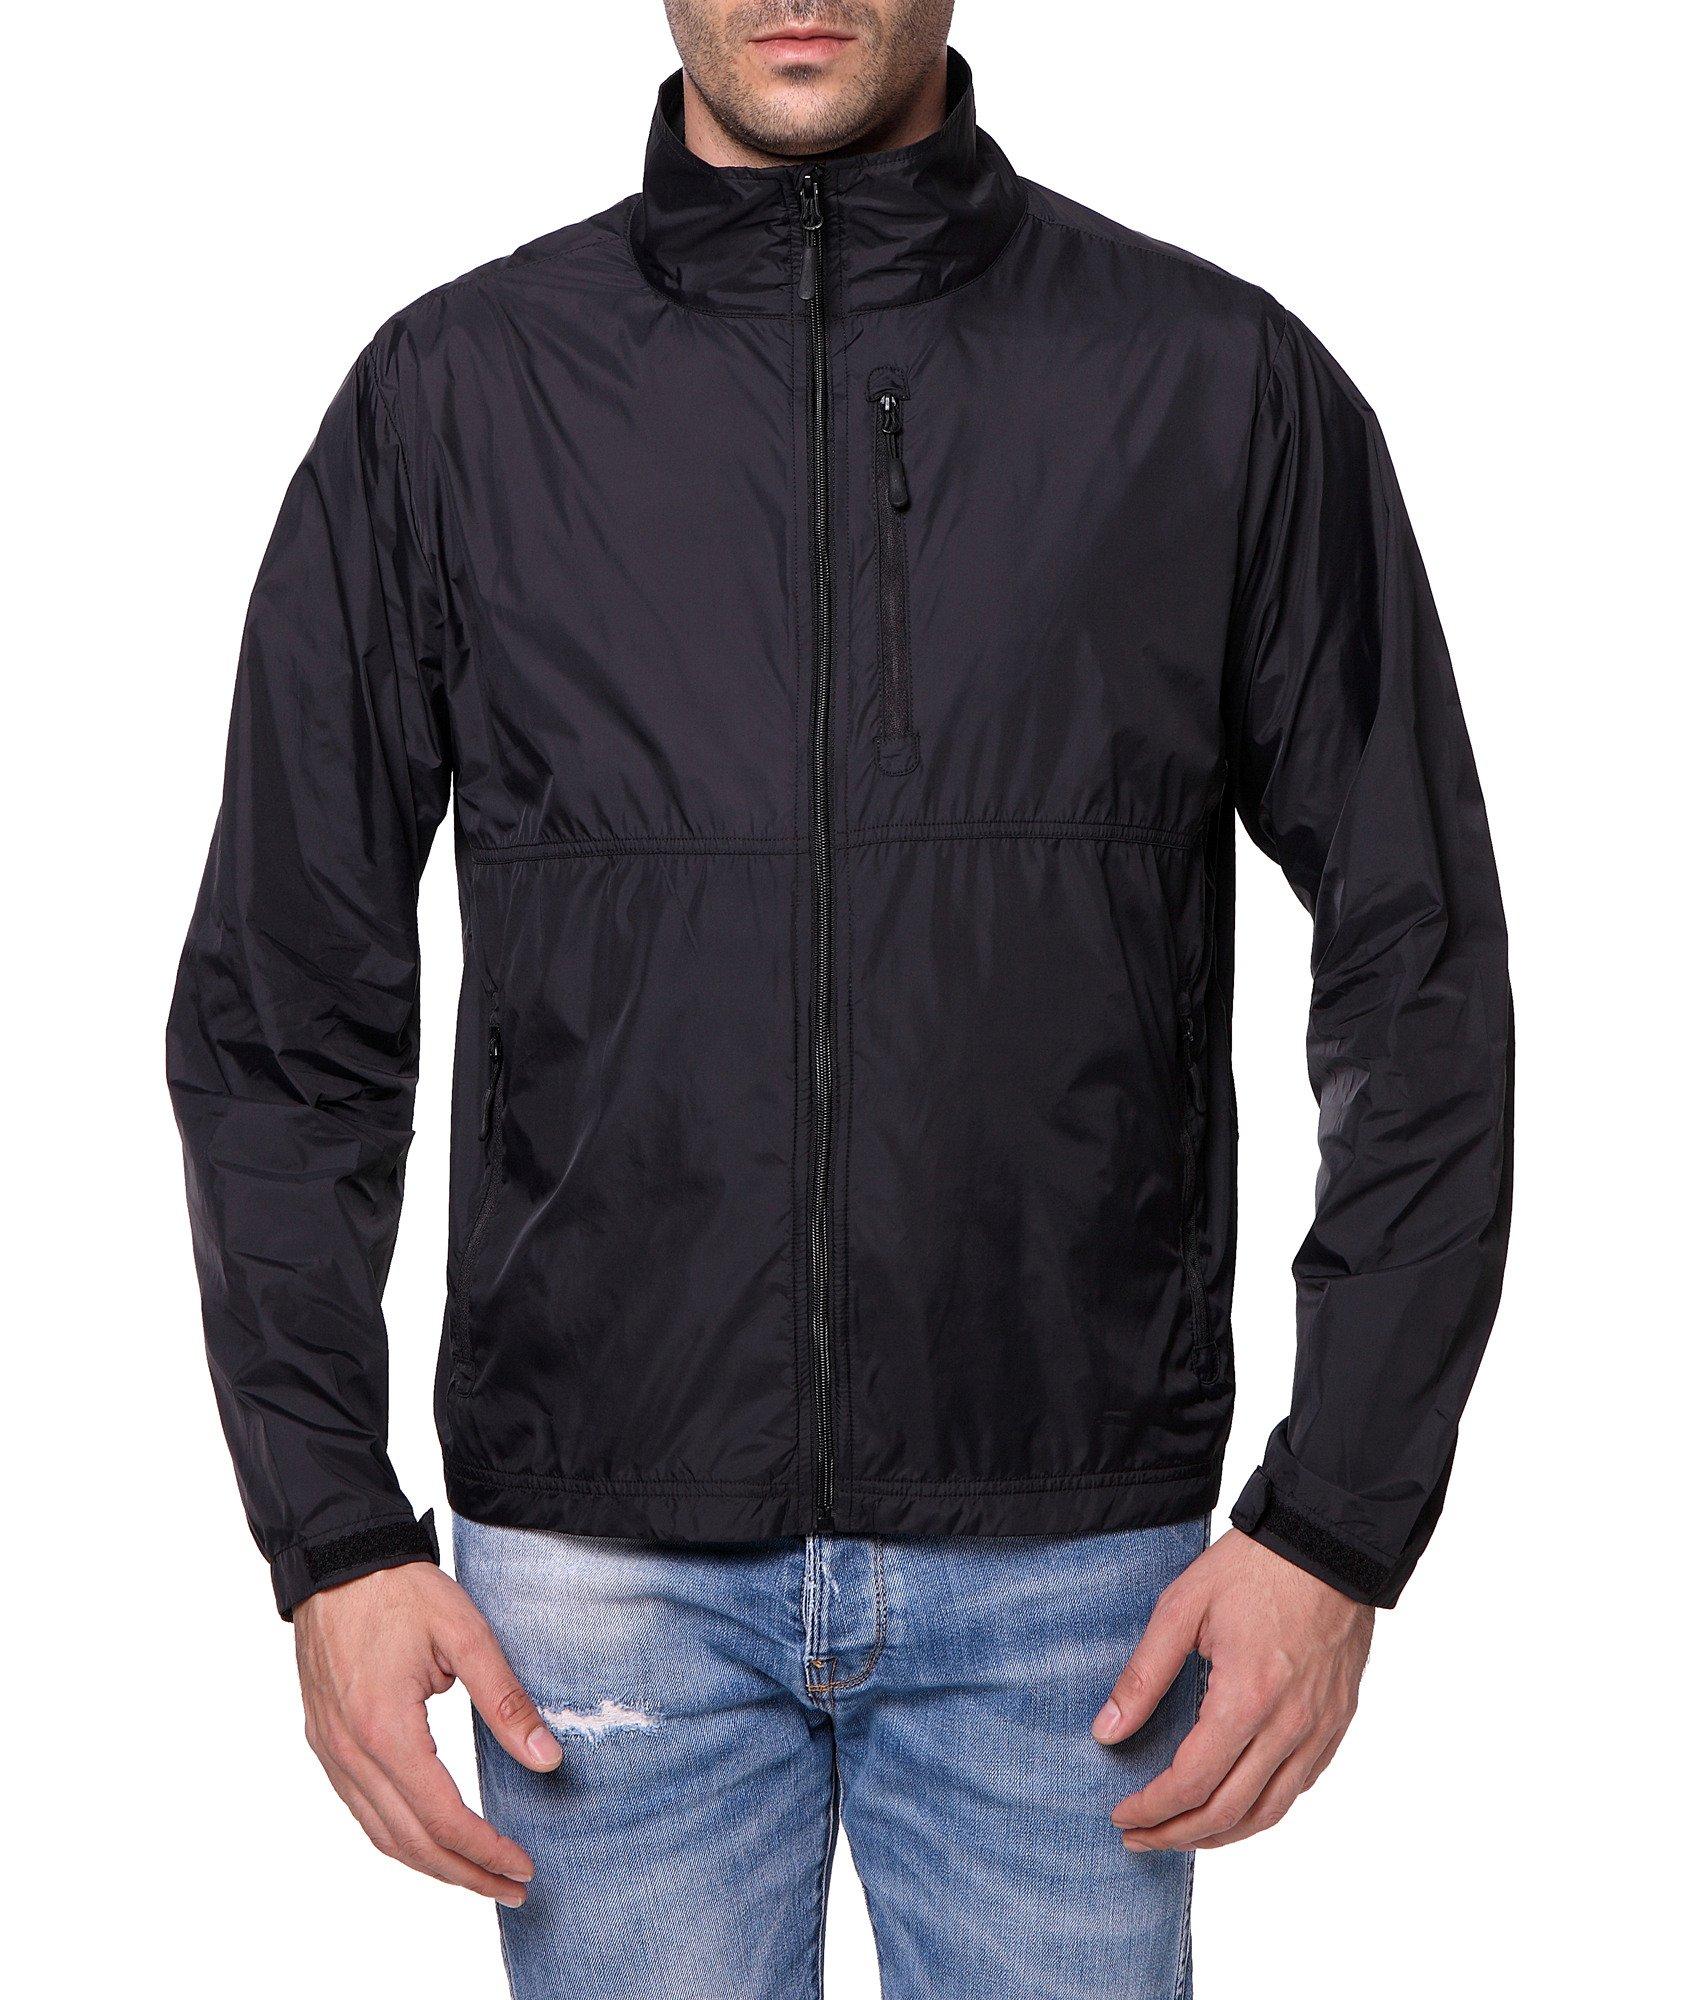 Trailside Supply Co. Men's Standard Water-Resistant Nylon Windbreaker Front-Zip up Jacket, Jet Black, 4X-Large by Trailside Supply Co.